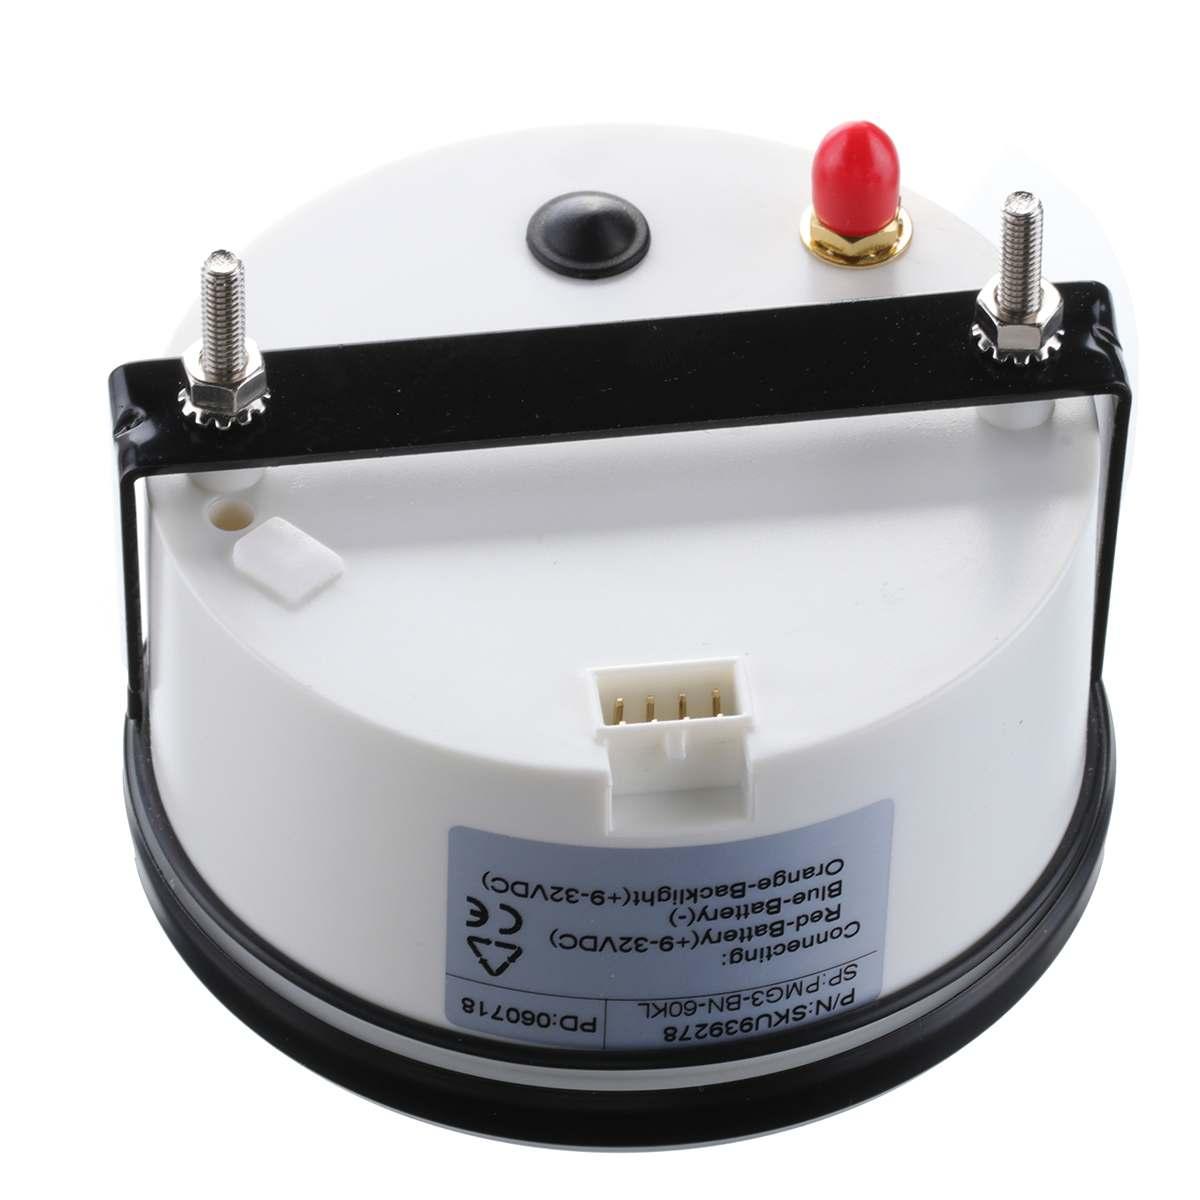 85mm Auto Car Truck Marine GPS Speedometer Waterproof Speed Sensor Meter Gauge Digital Odometer Automobiles Replacement Parts 8